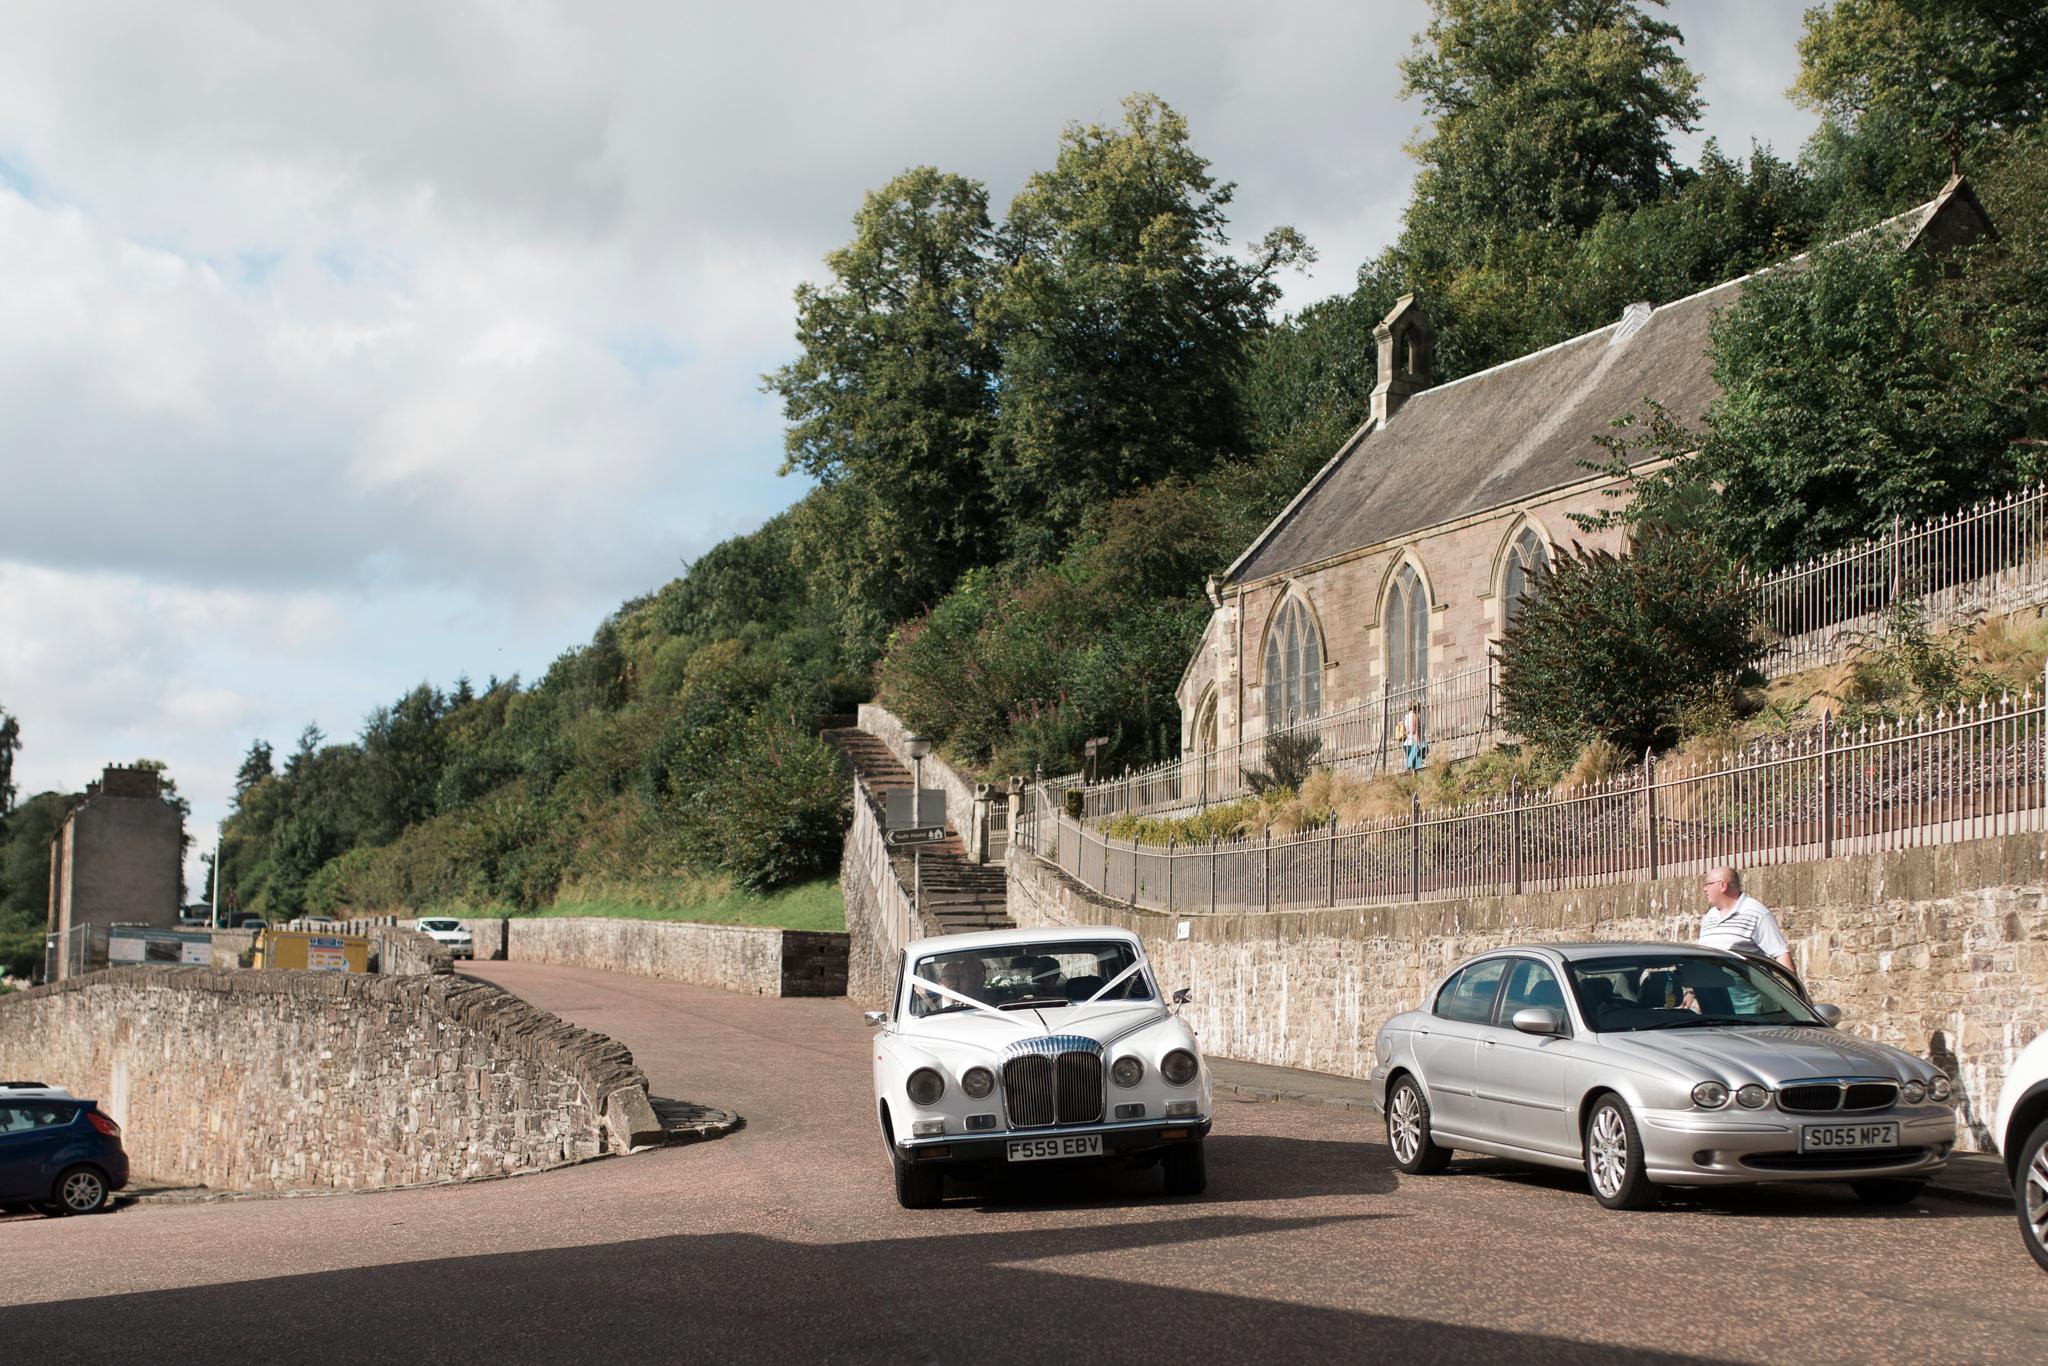 071-scotland-wedding-photographer.jpg